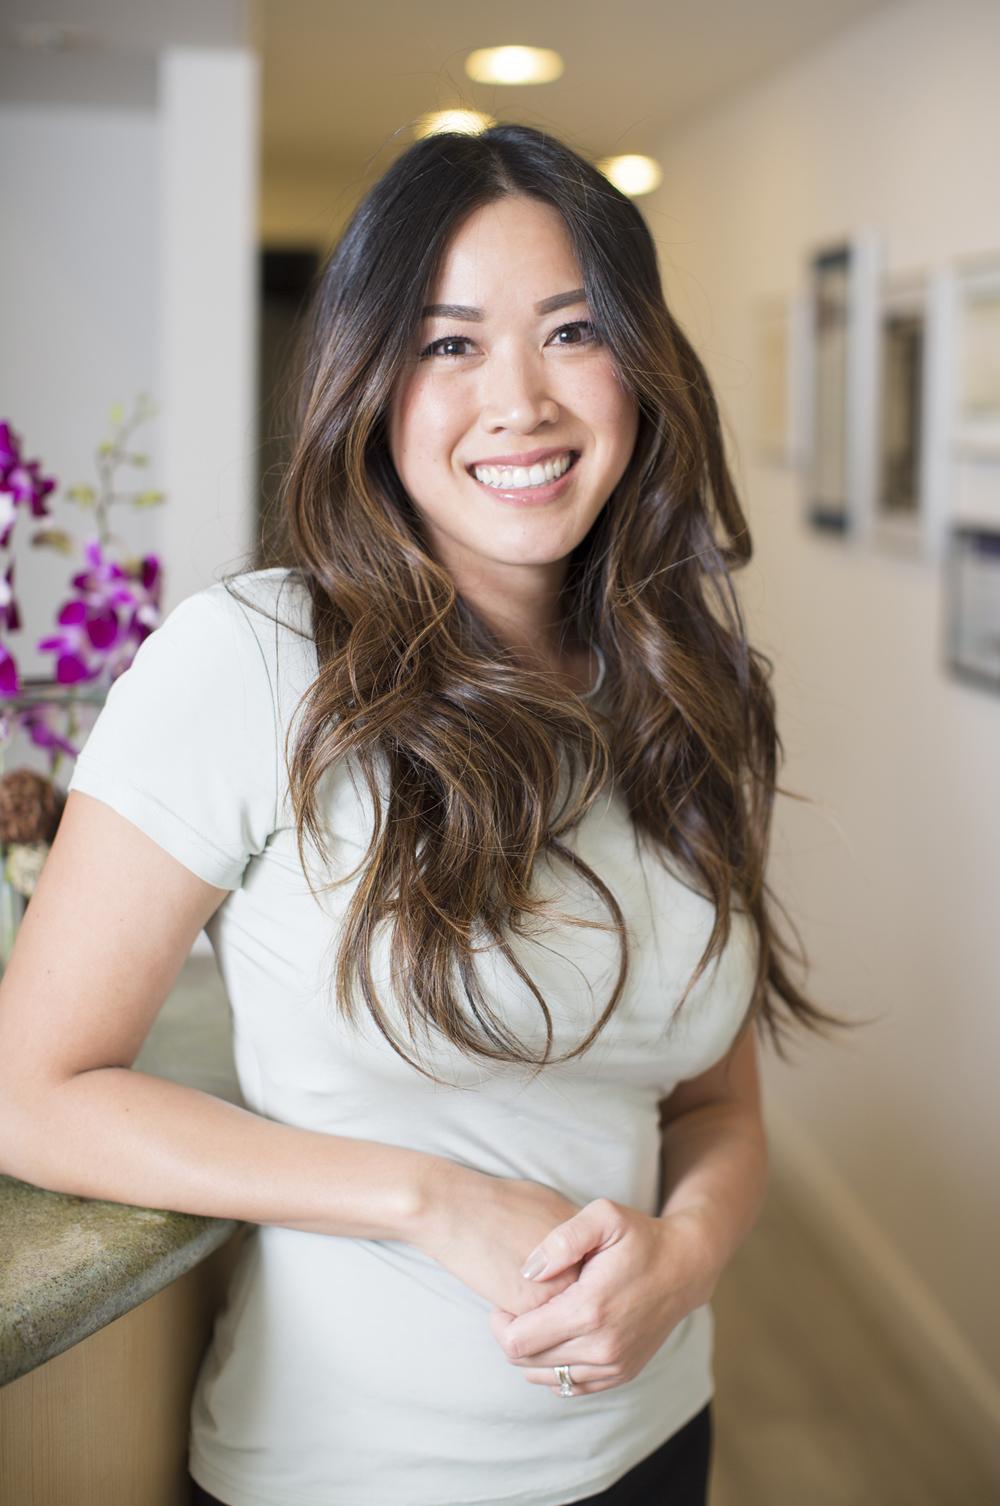 Han Nguyen, Practice Administrator, and Registered Dental Hygienist at Nice Teeth Dental in San Leandro, California.